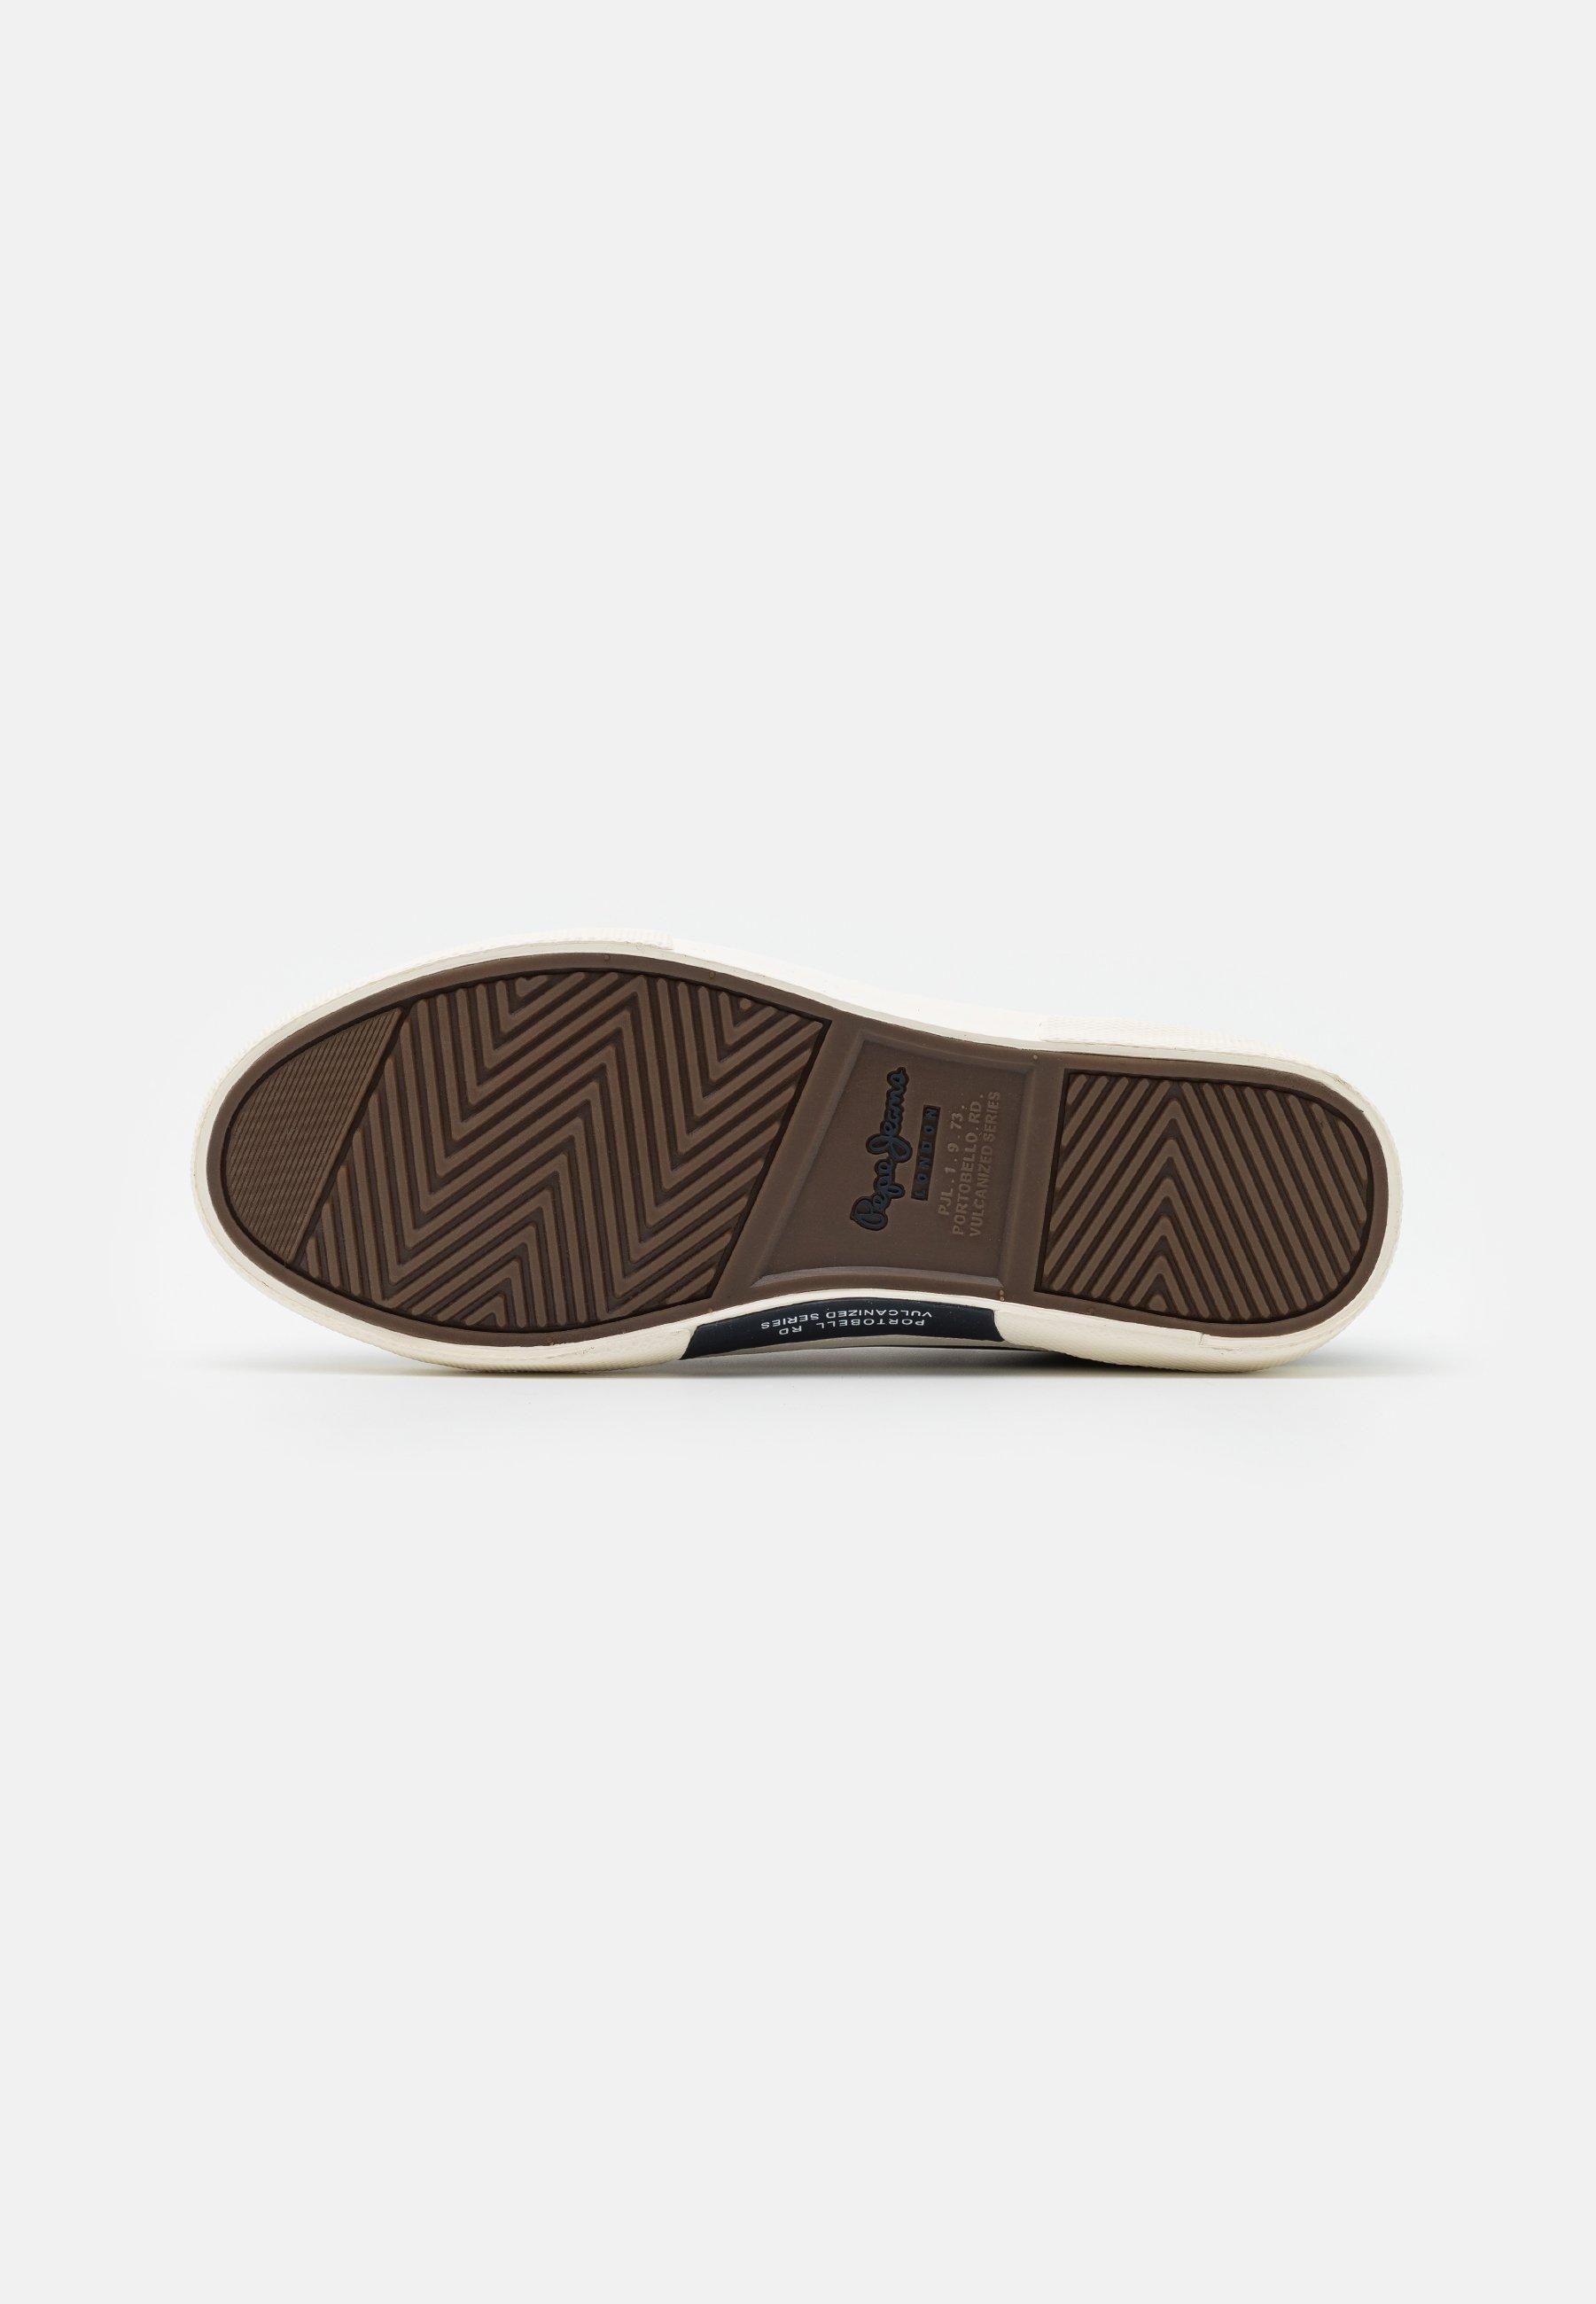 Pepe Jeans KENTON CLASSIC MAN - Sneaker low - navy/blau - Herrenschuhe 6OPja